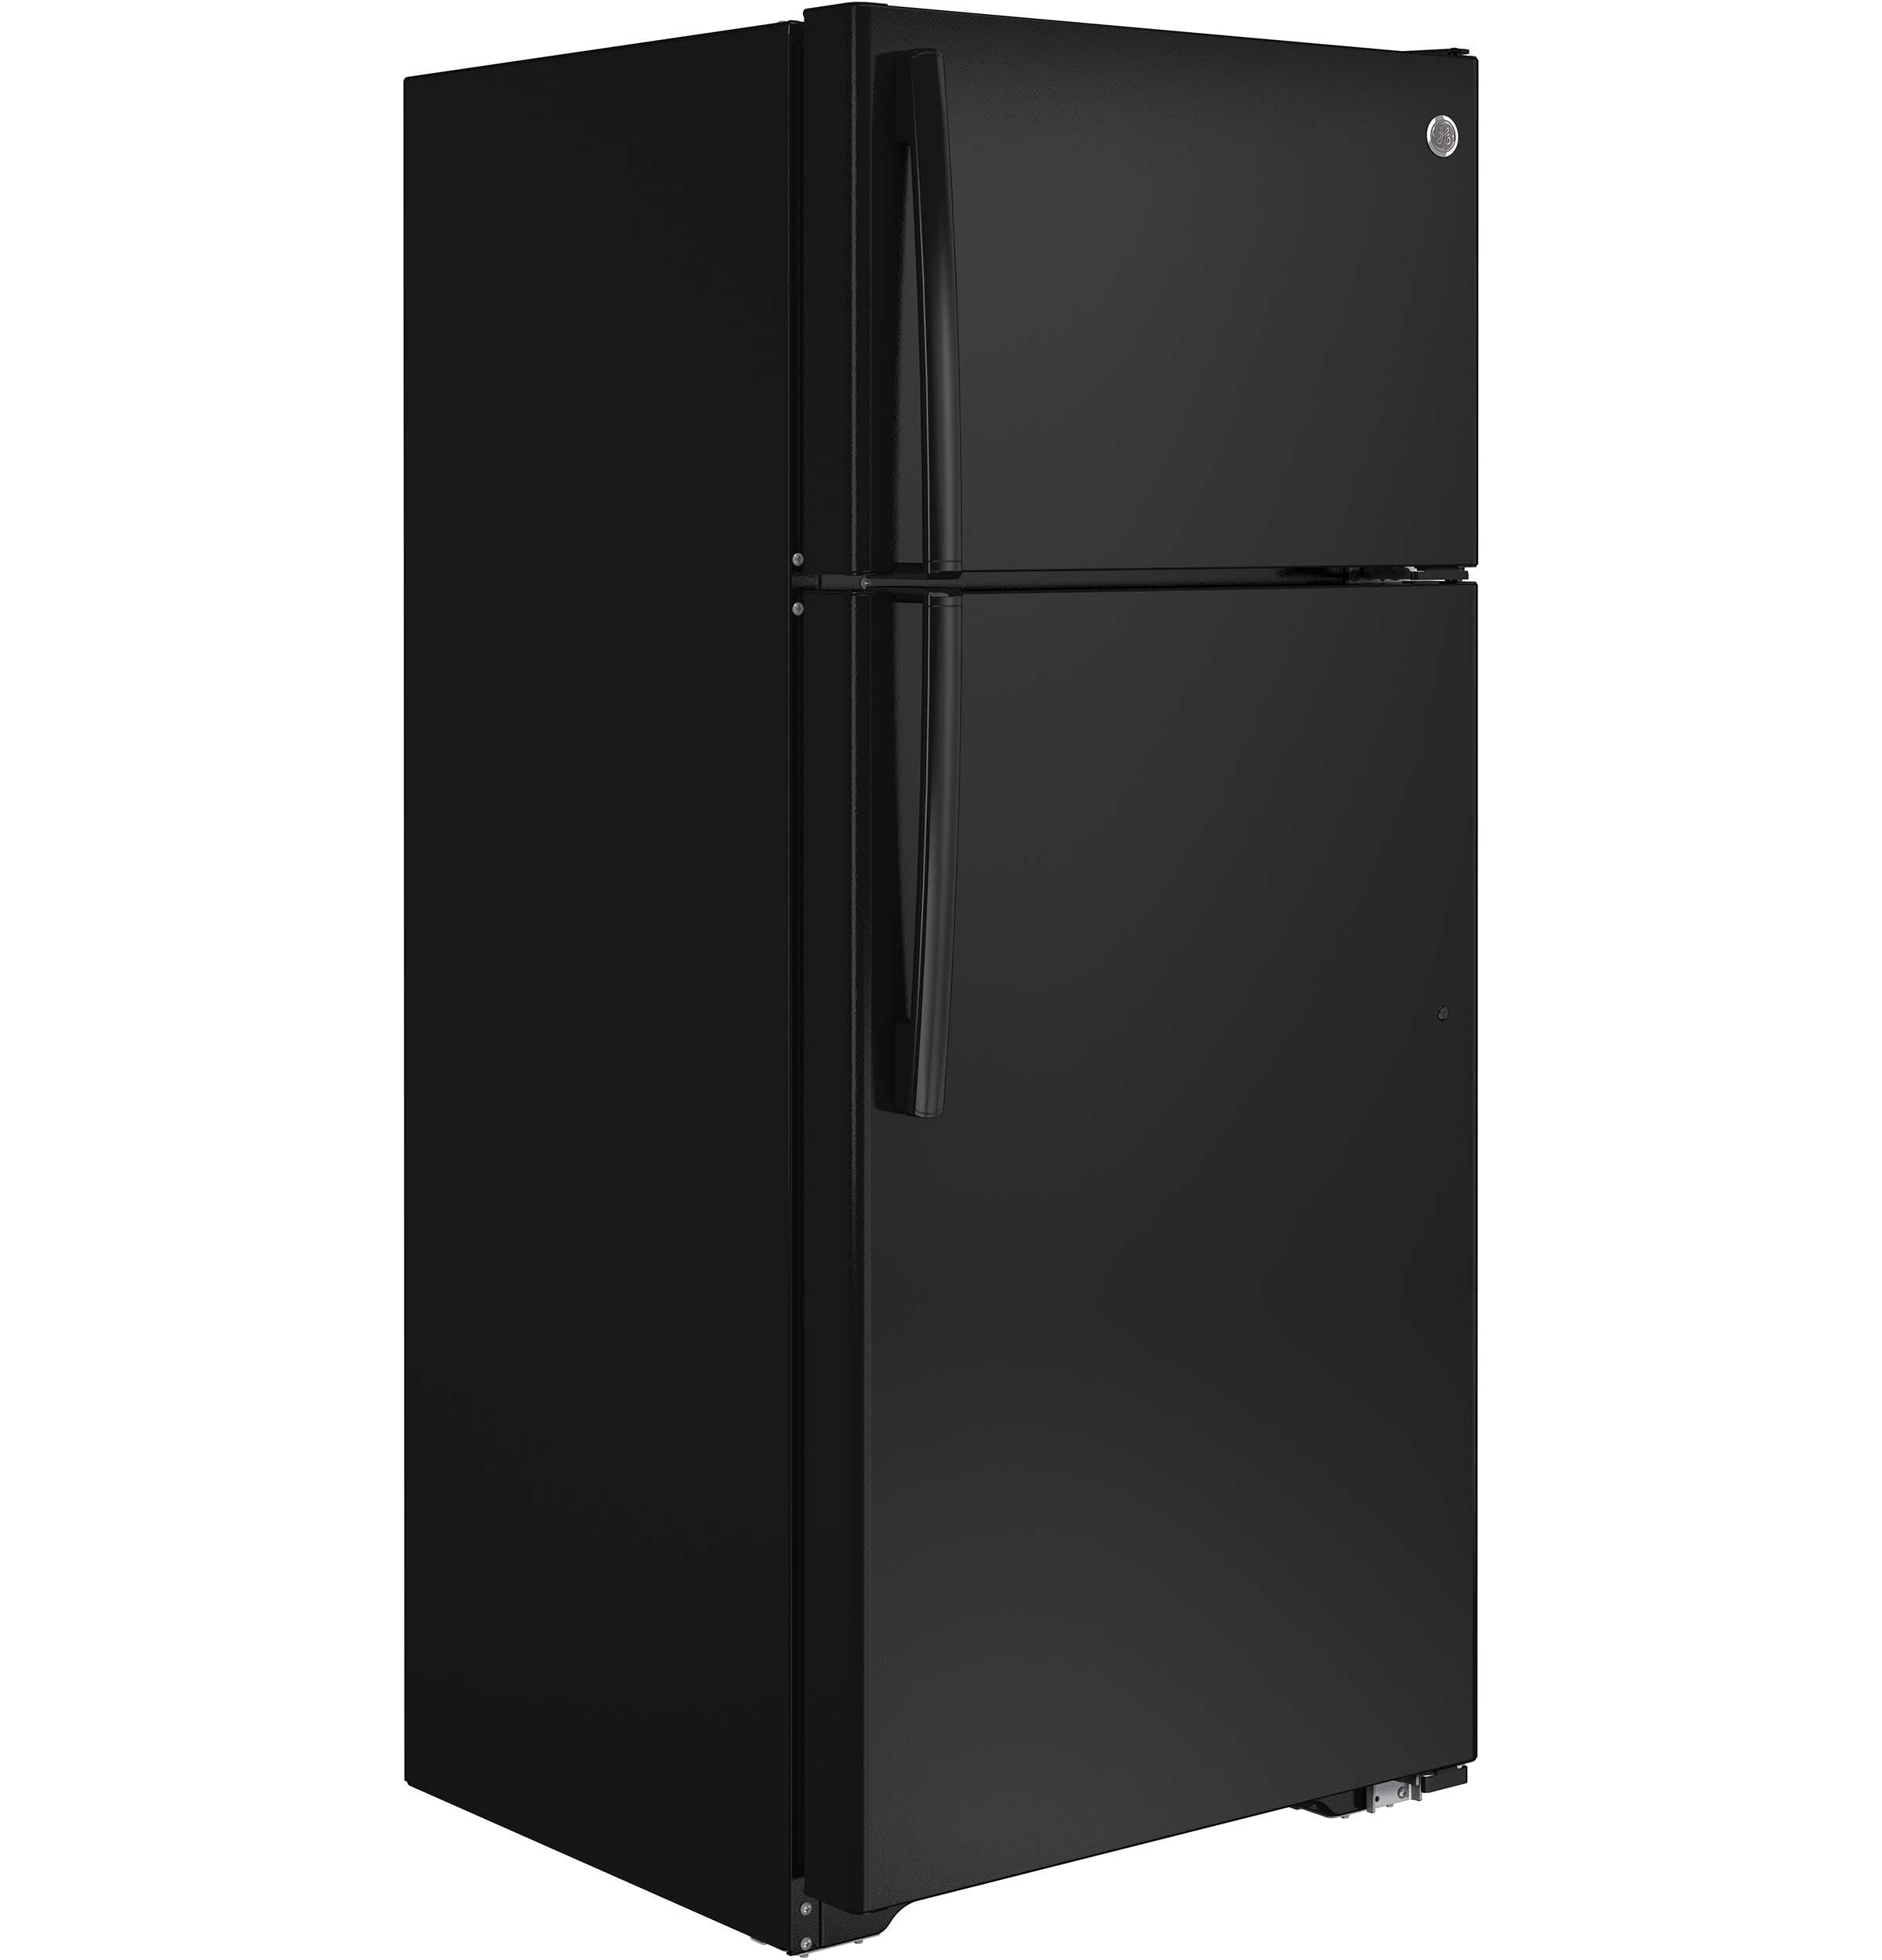 Model: GTE16DTHBB | GE® ENERGY STAR® 15.5 Cu. Ft. Top-Freezer Refrigerator